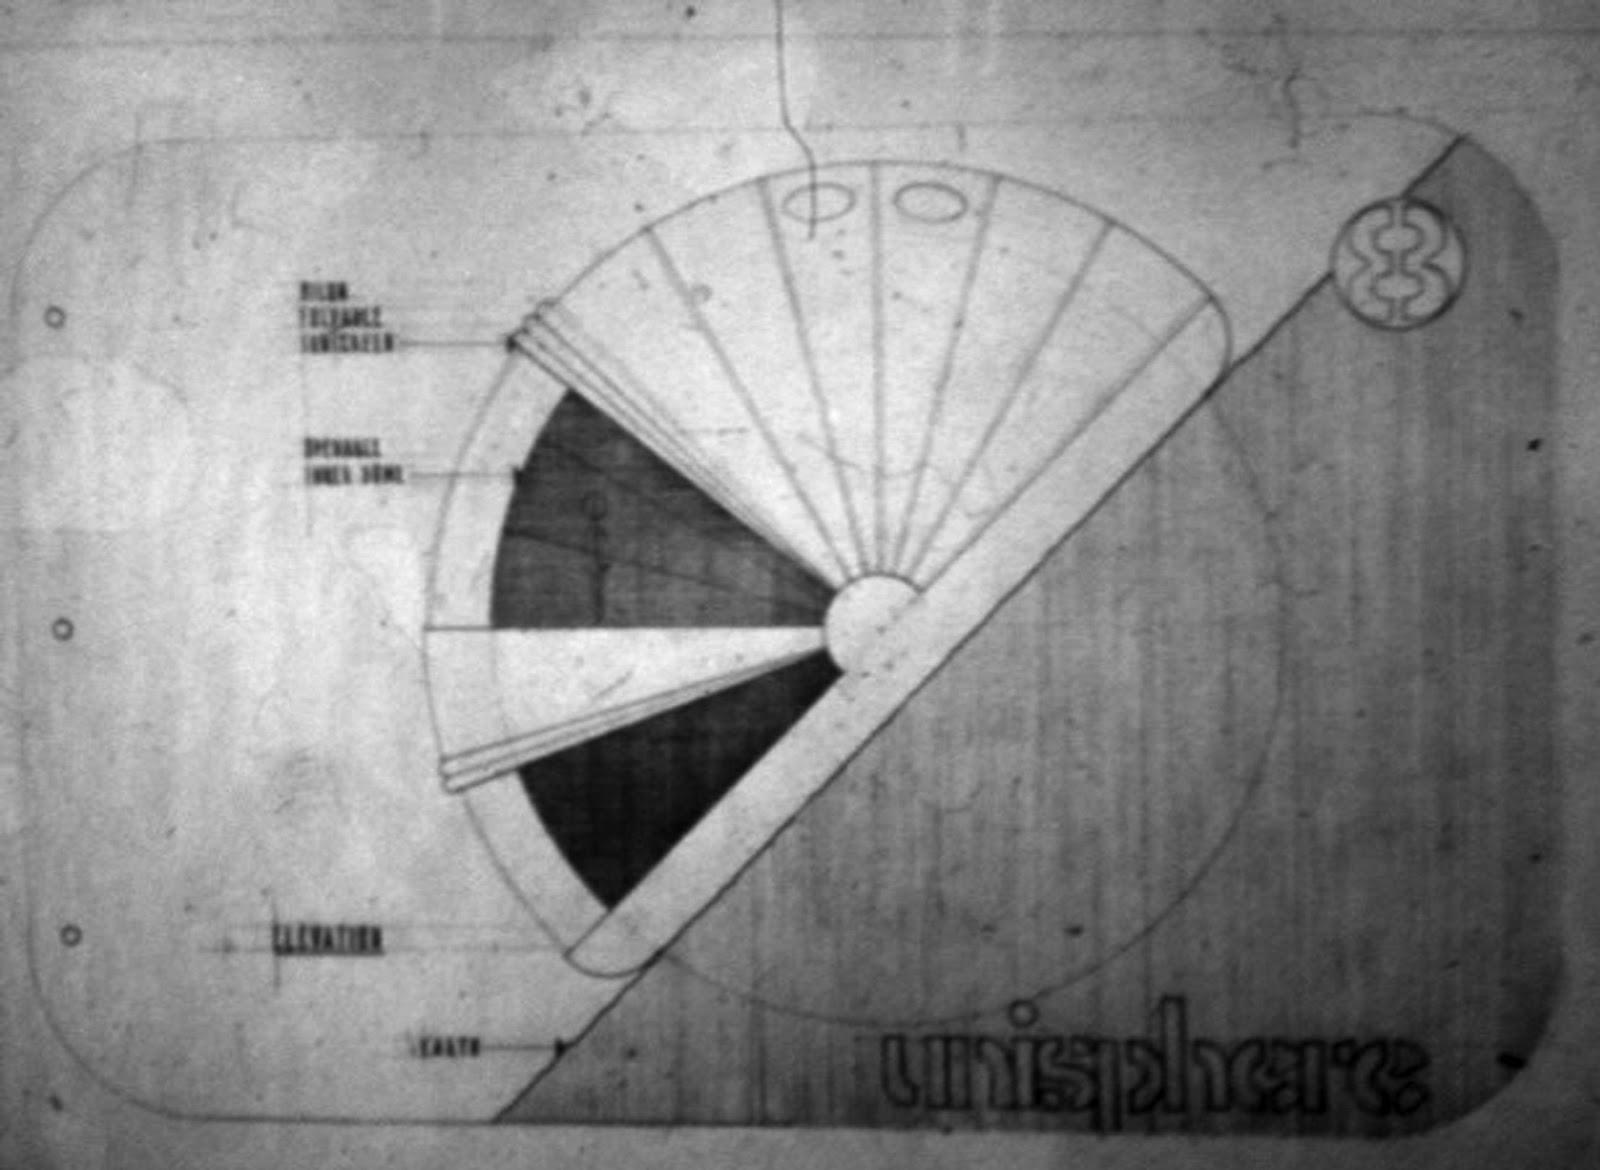 Eugene ray architect aerodyne double dome 1986 universal spheroid